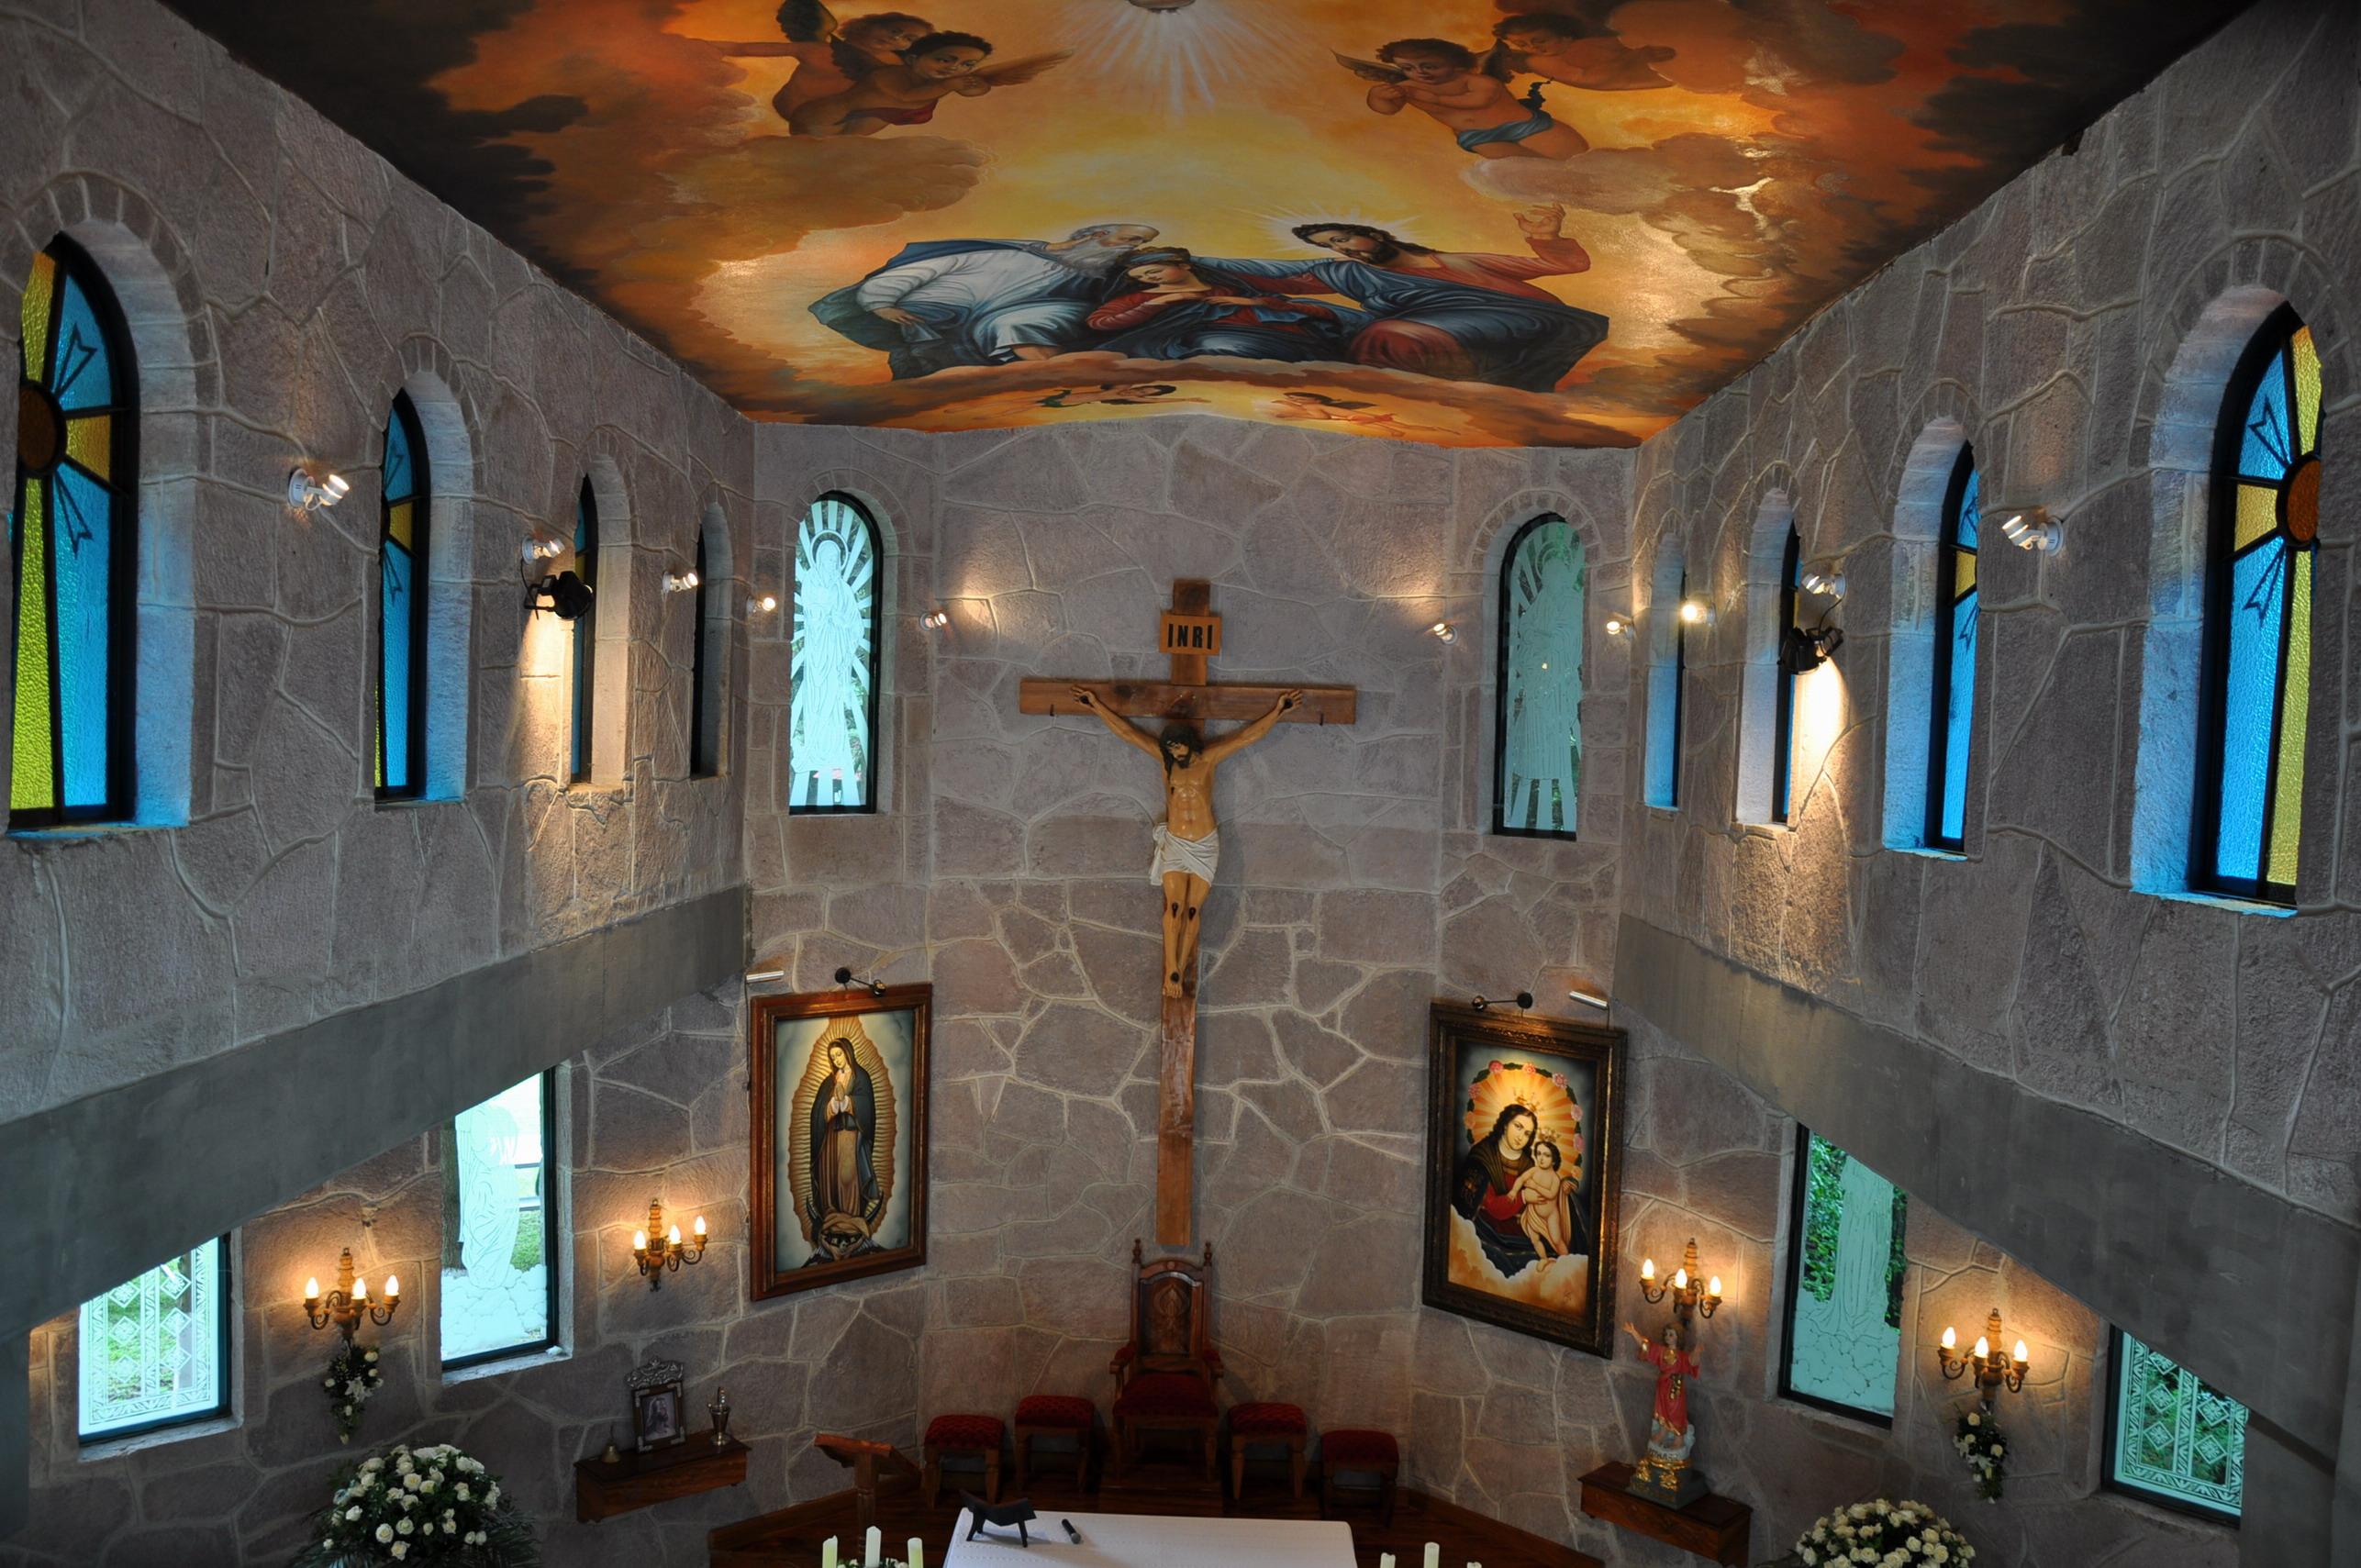 iglesia para realizar tu boda catolica